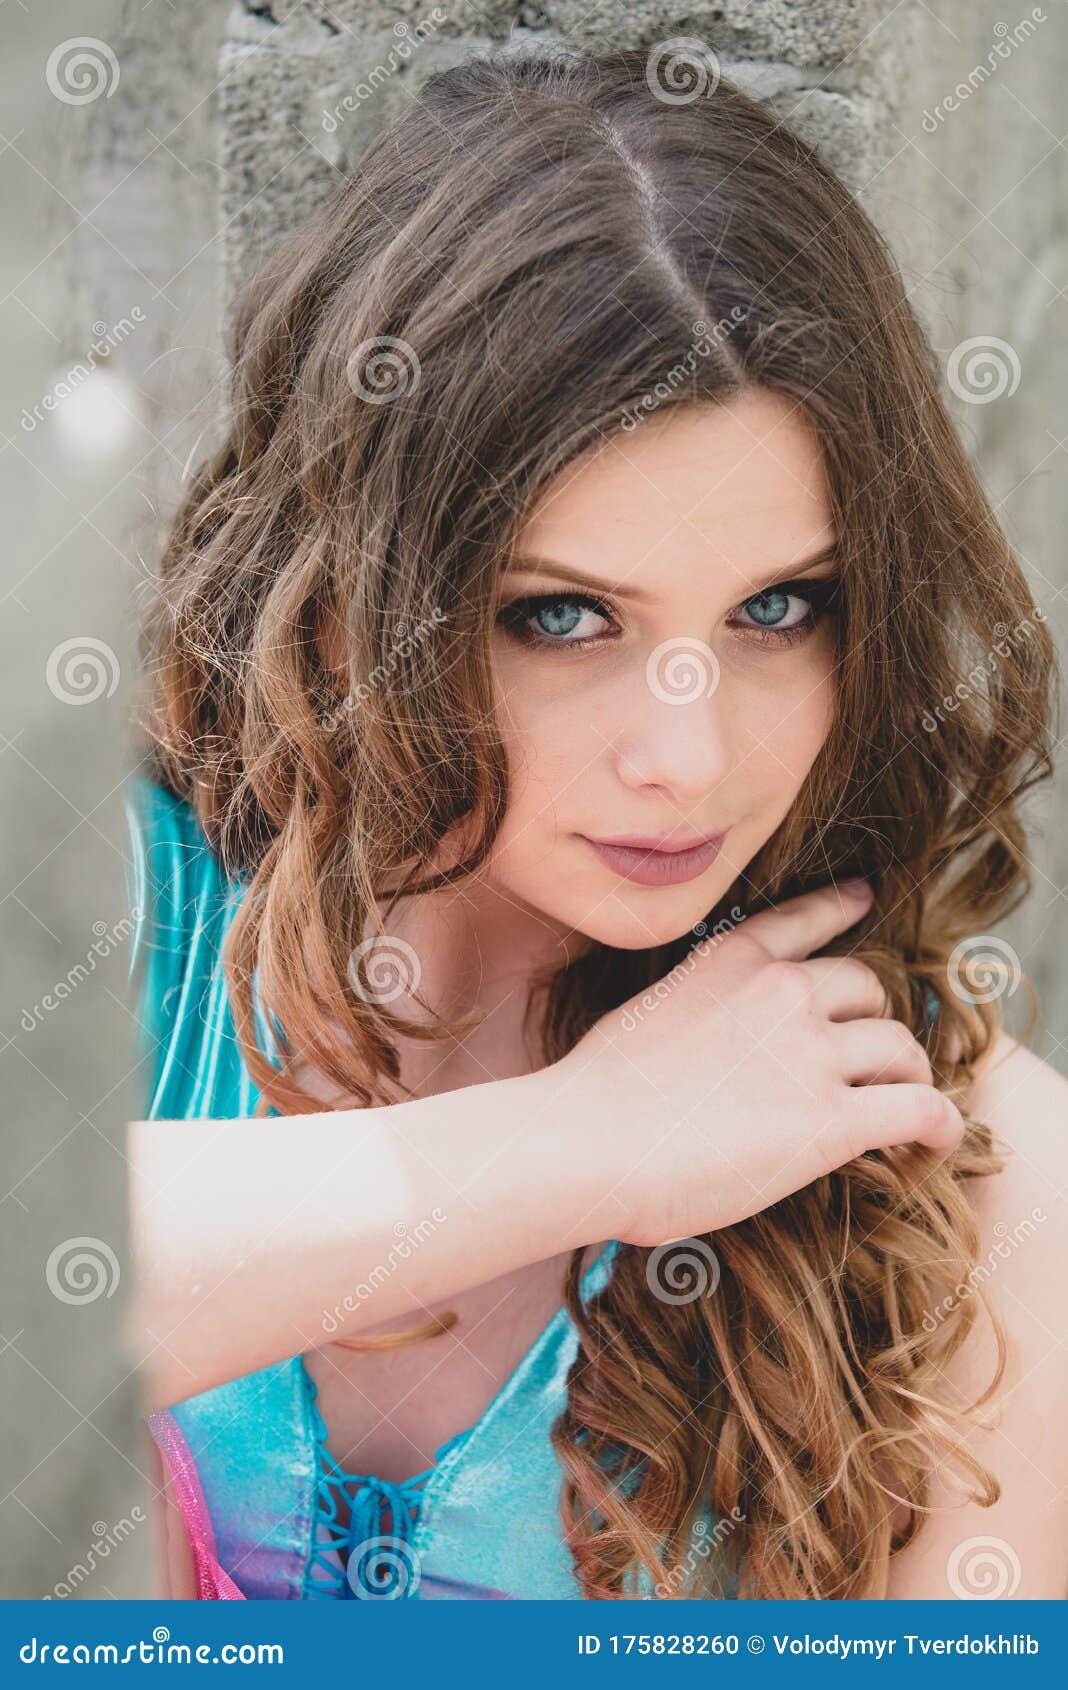 Eye Makeup Royalty Free Stock Photography - Image: 37085057